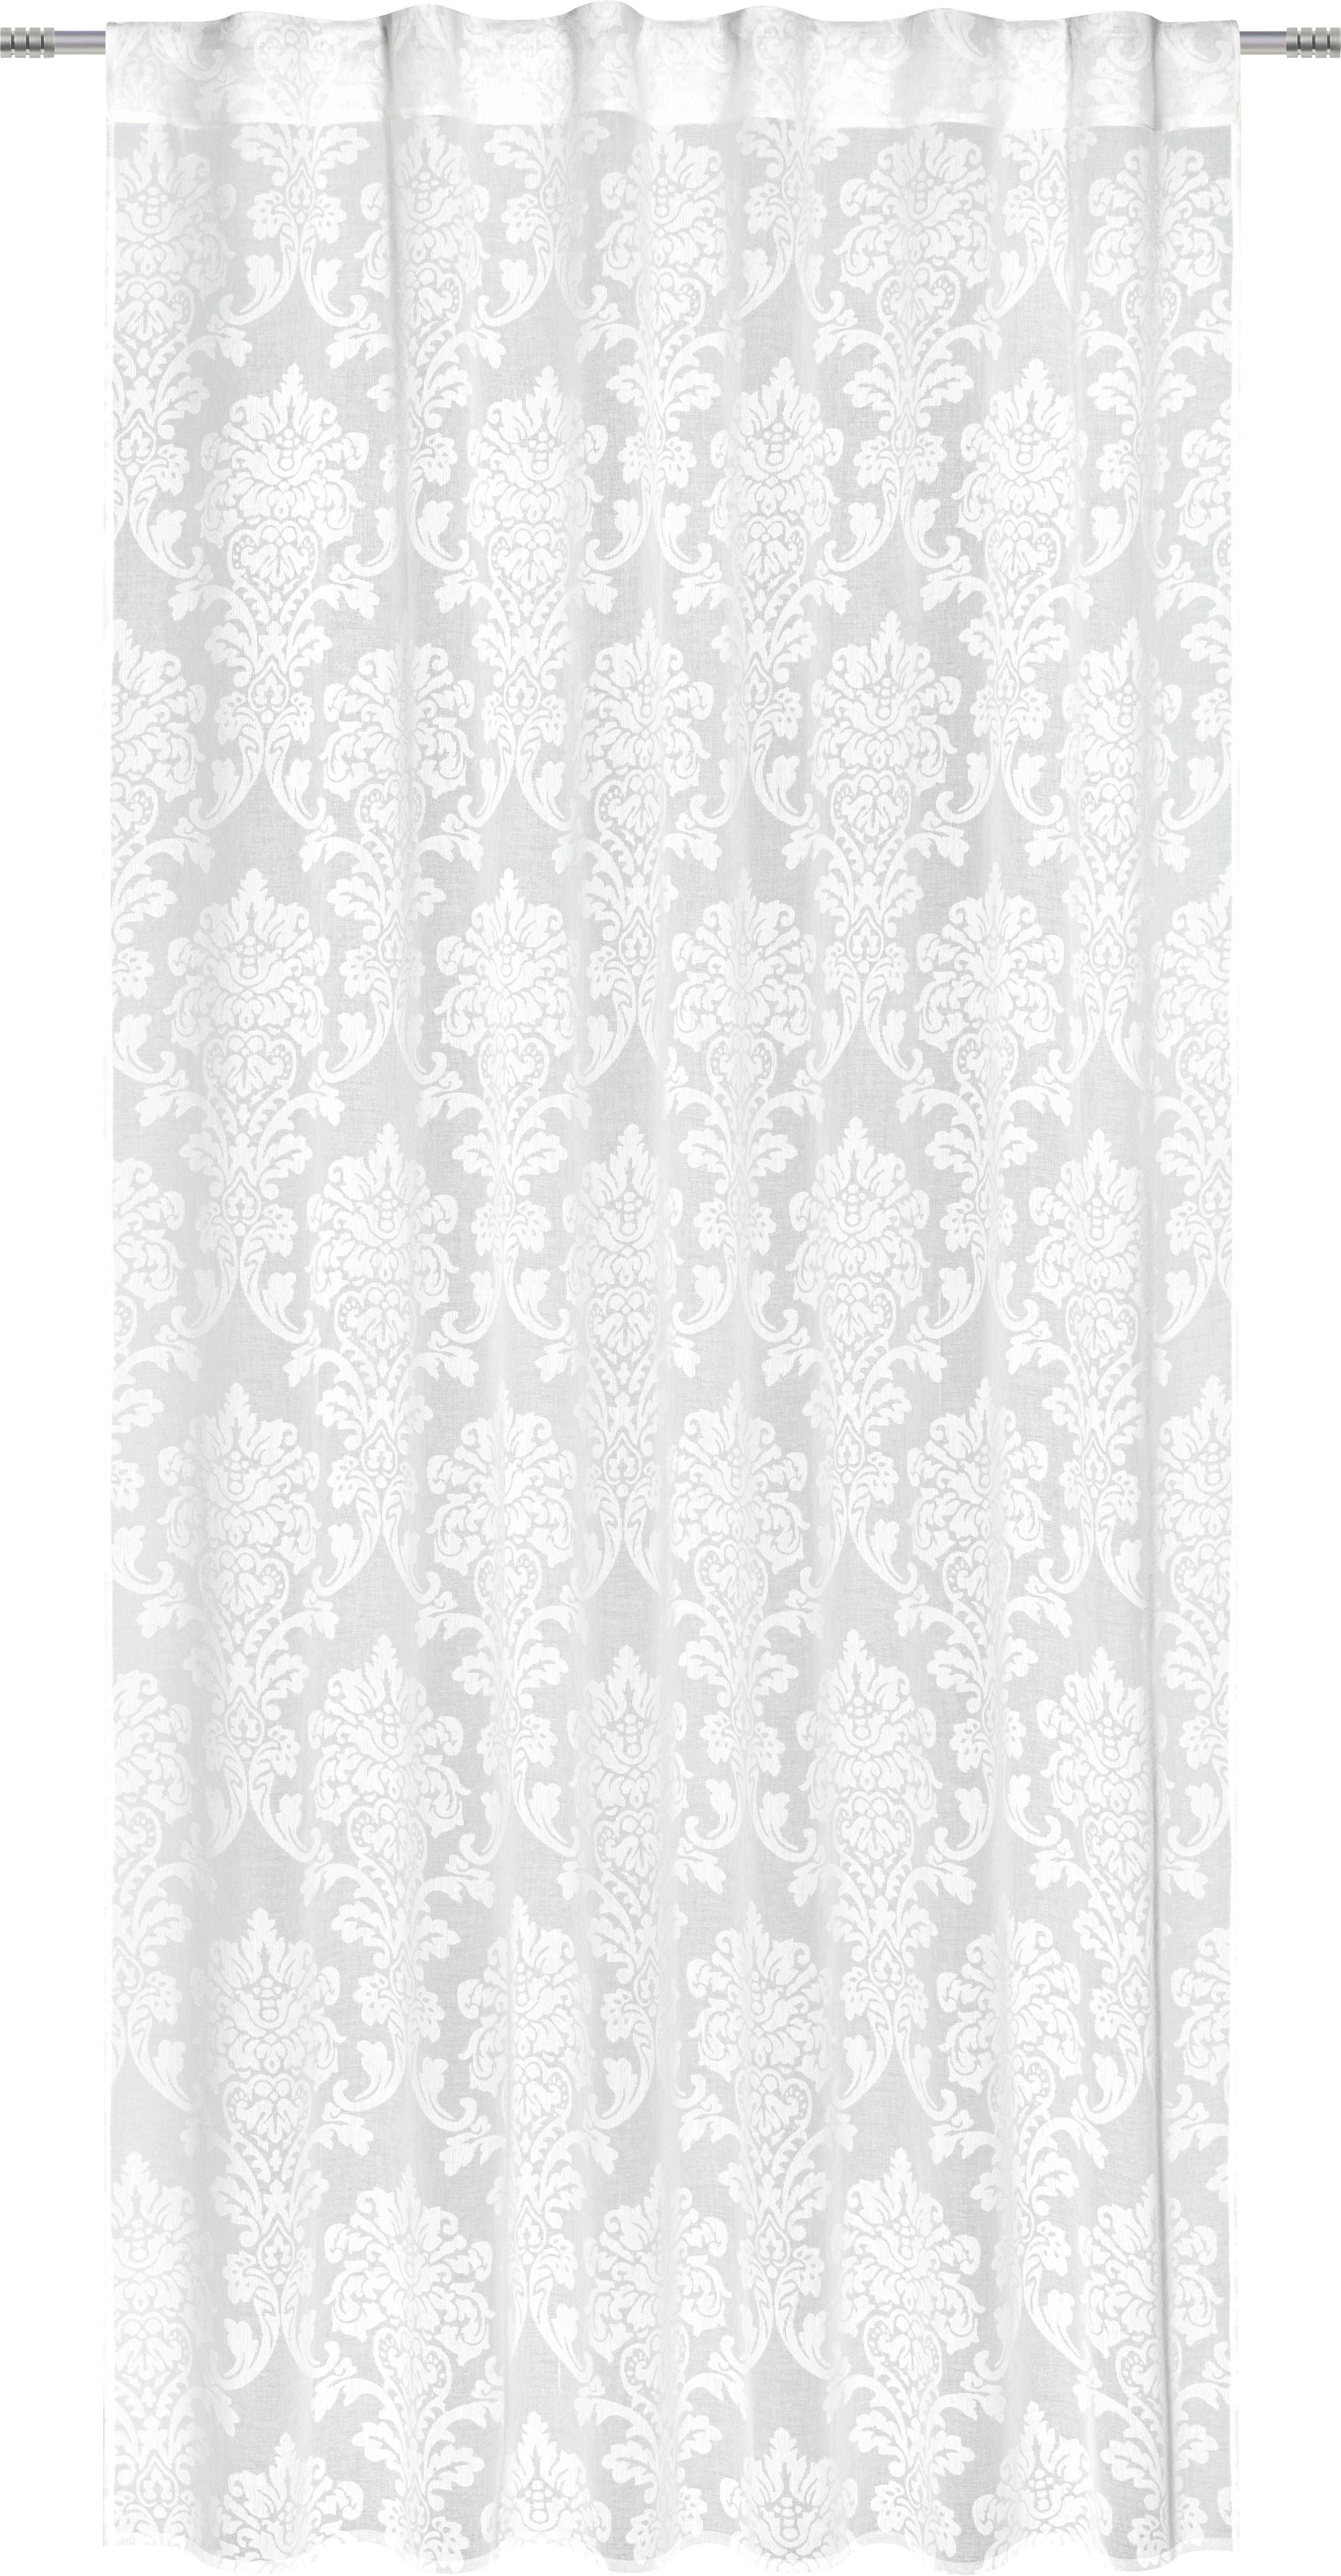 Schlaufenschal Ornament, ca. 140x245cm - Creme, LIFESTYLE, Textil (140/245cm) - MÖMAX modern living